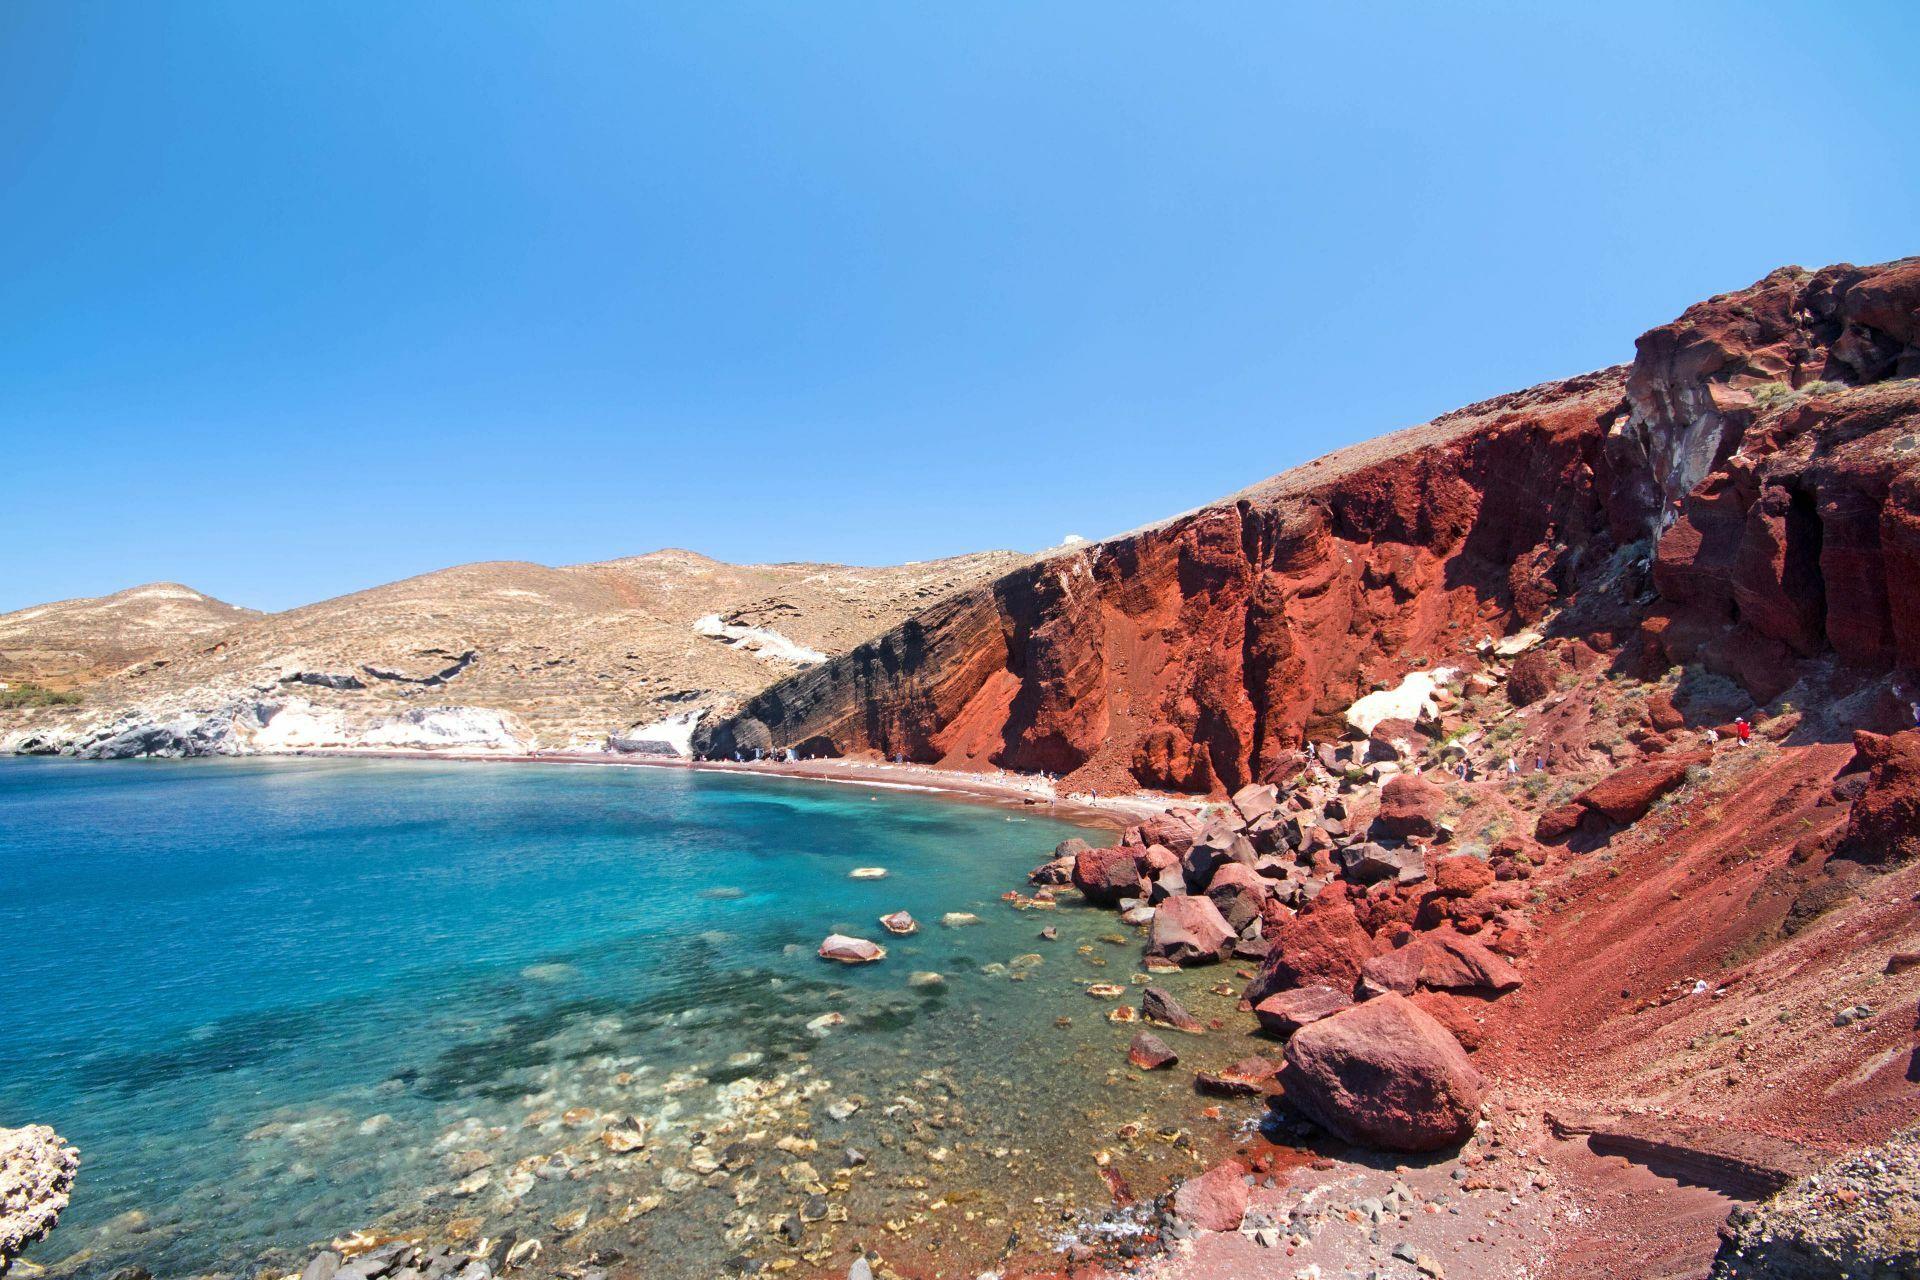 Santorini Greece: The Red Beach